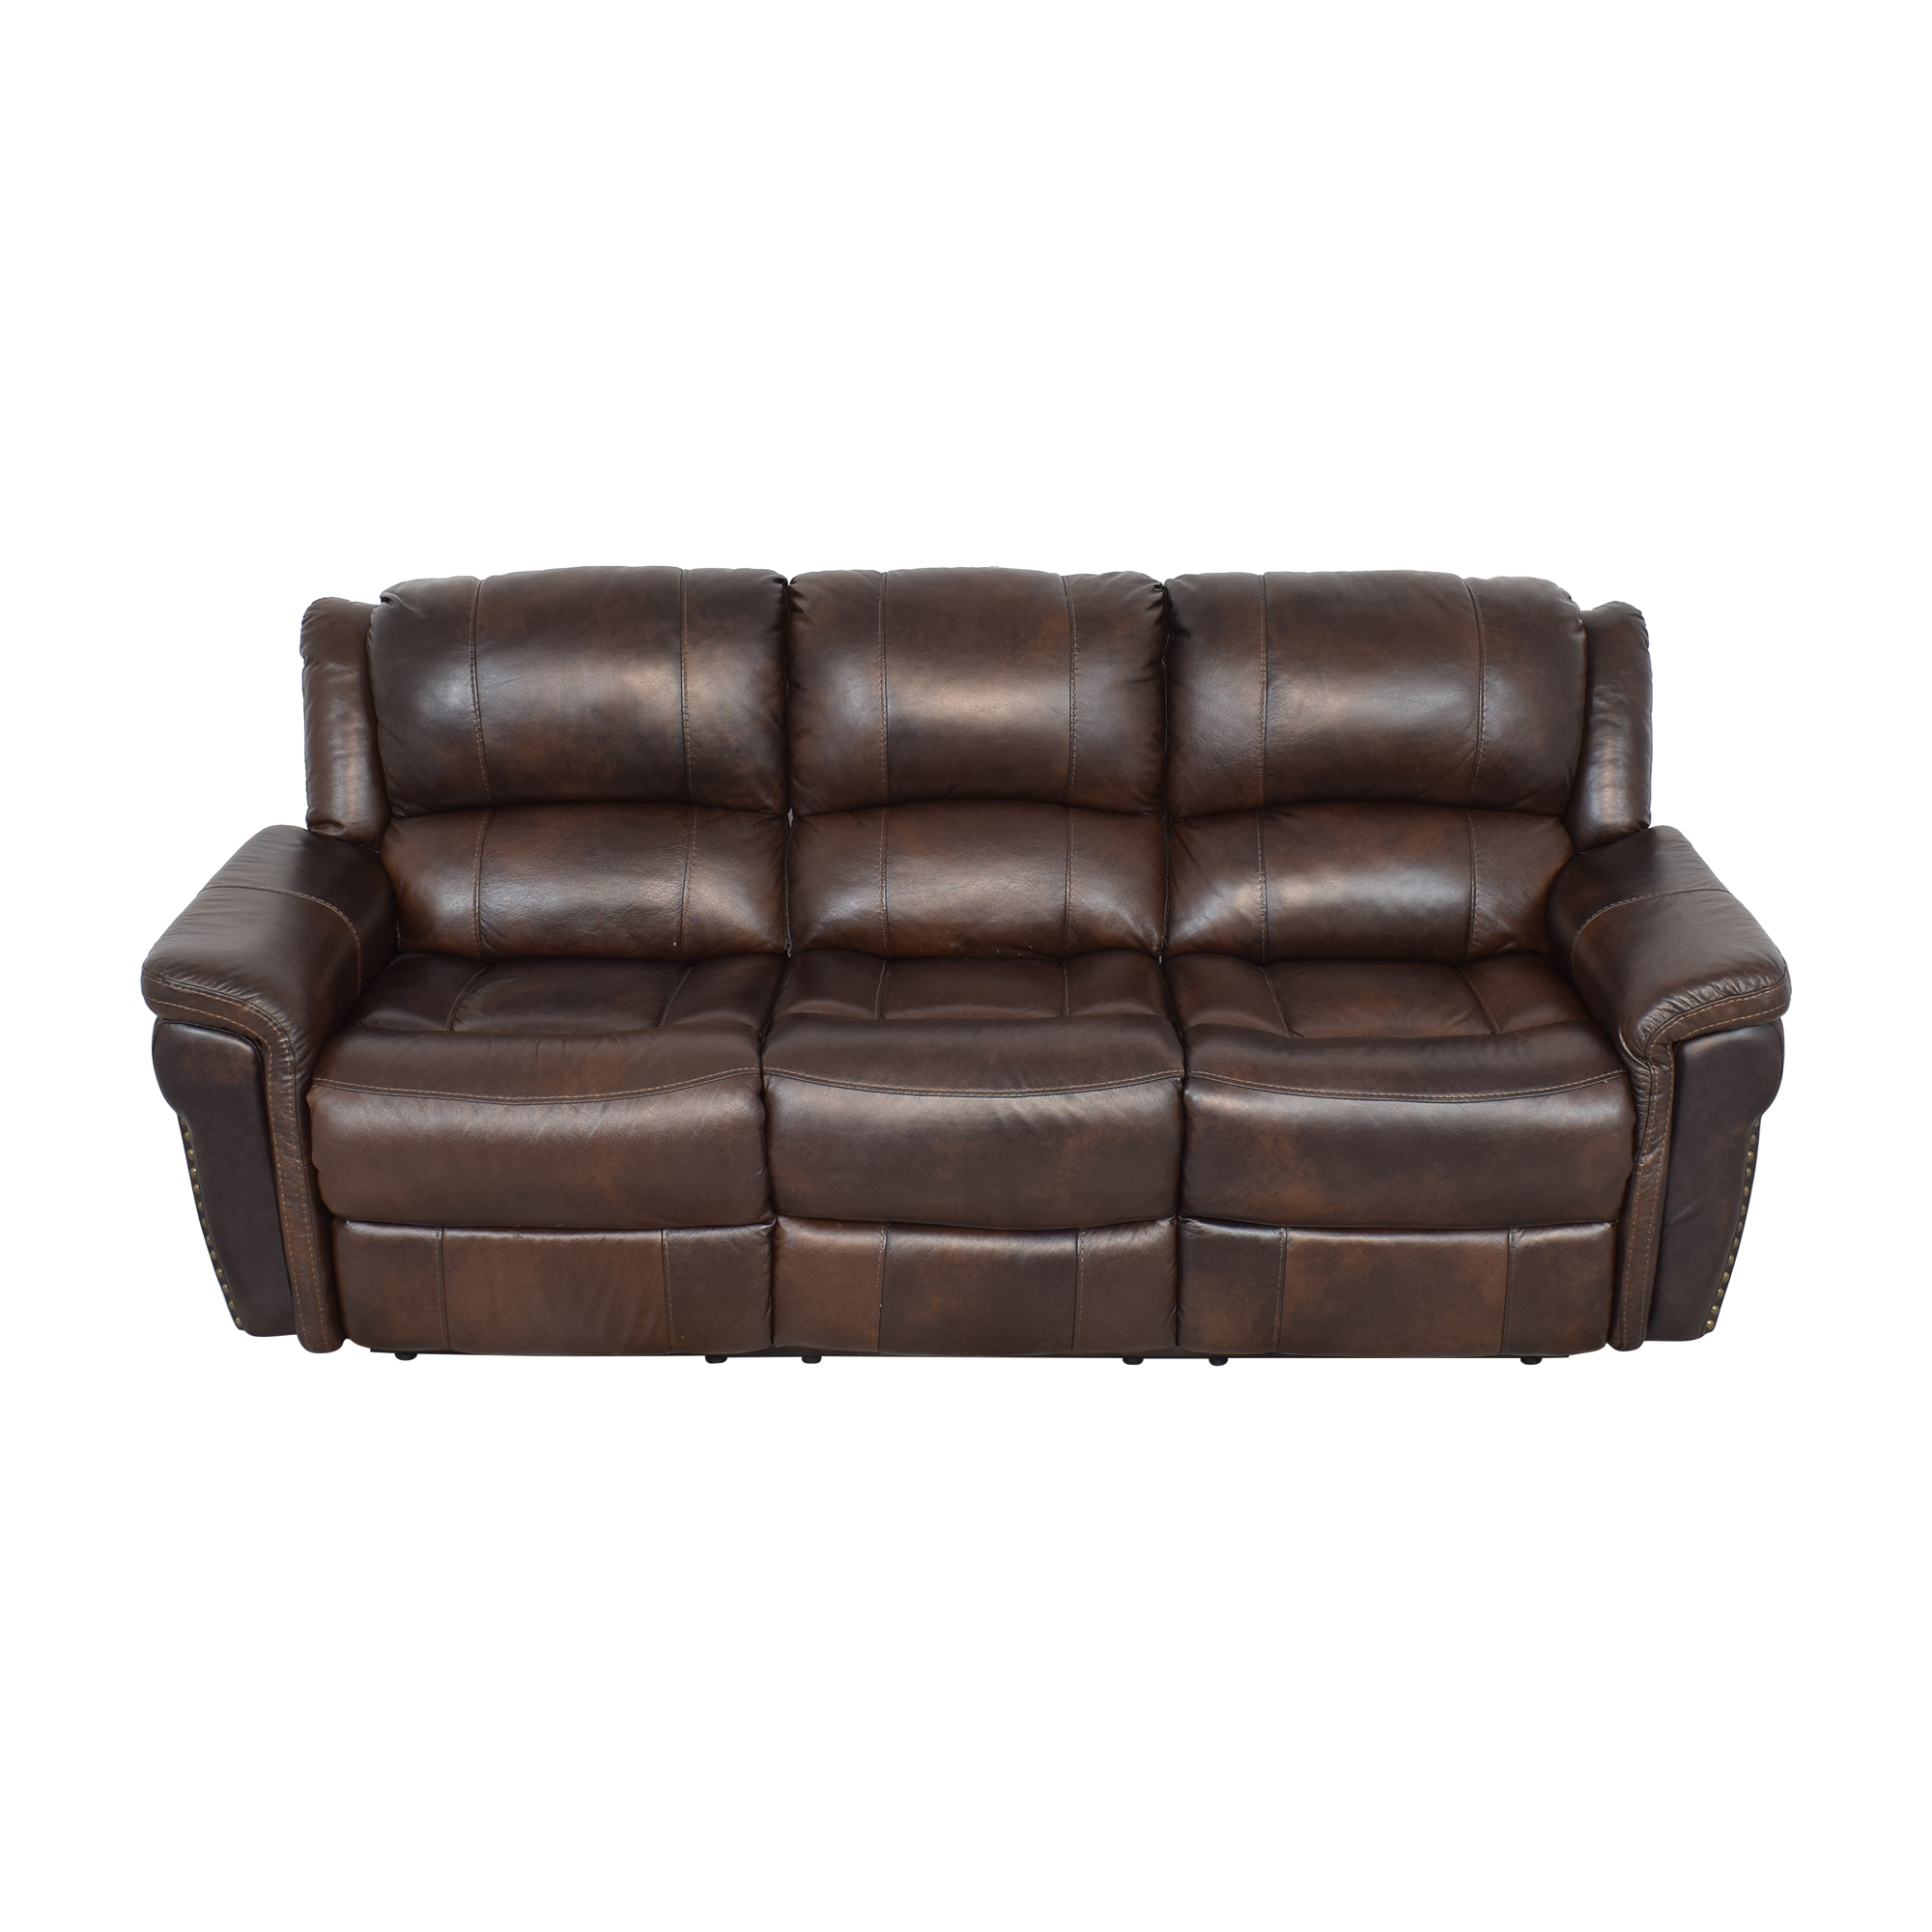 buy Delancey Street Furniture Recliner Sofa  Sofas